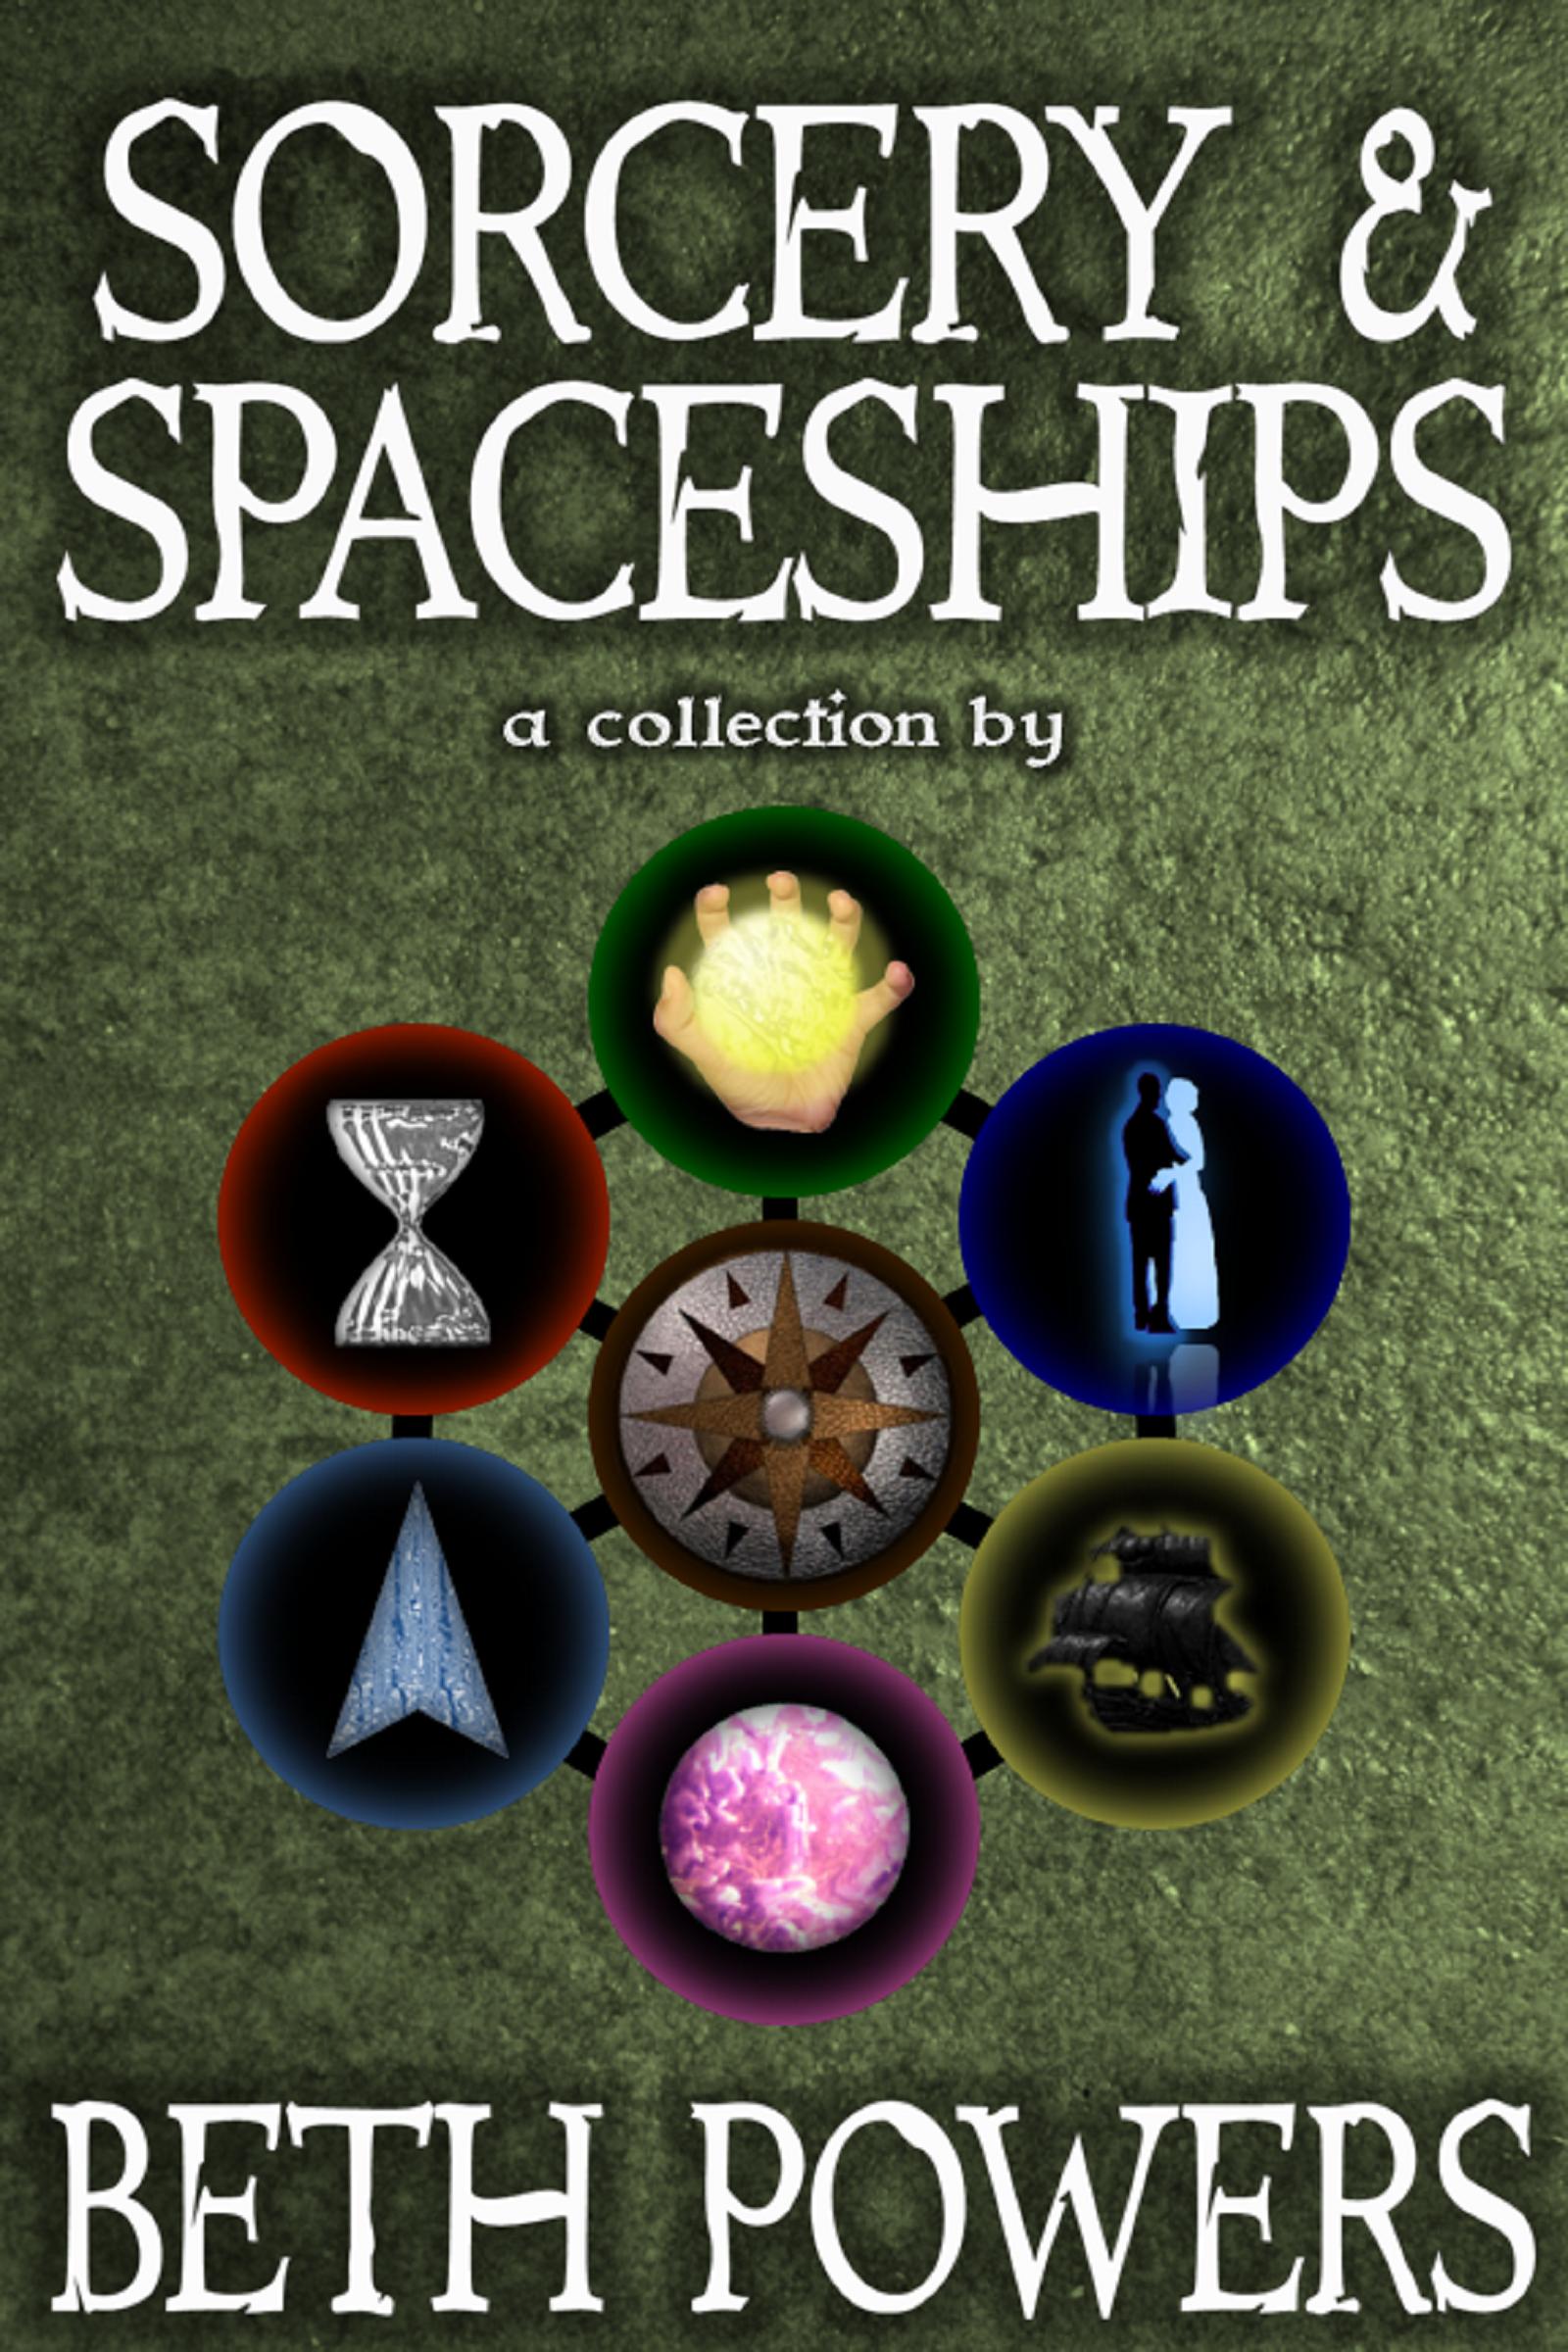 Sorcery & Spaceships